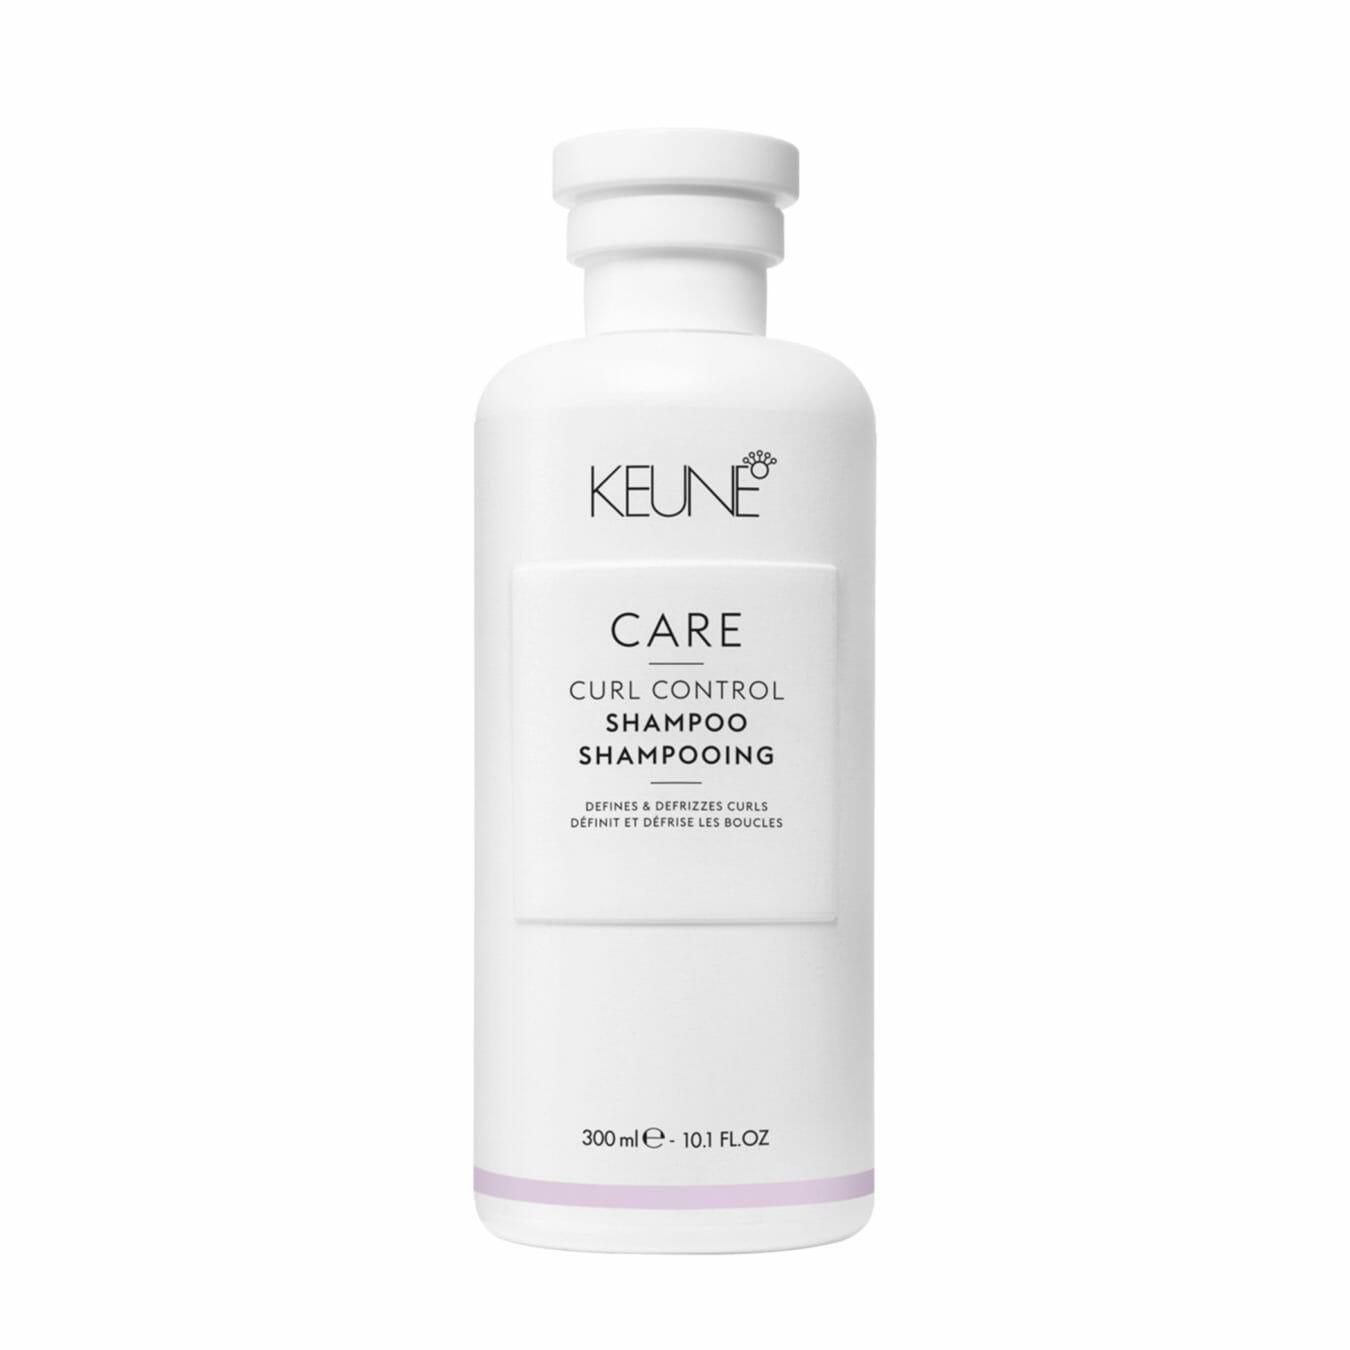 Kauf Keune Care Curl Control Shampoo 300ml